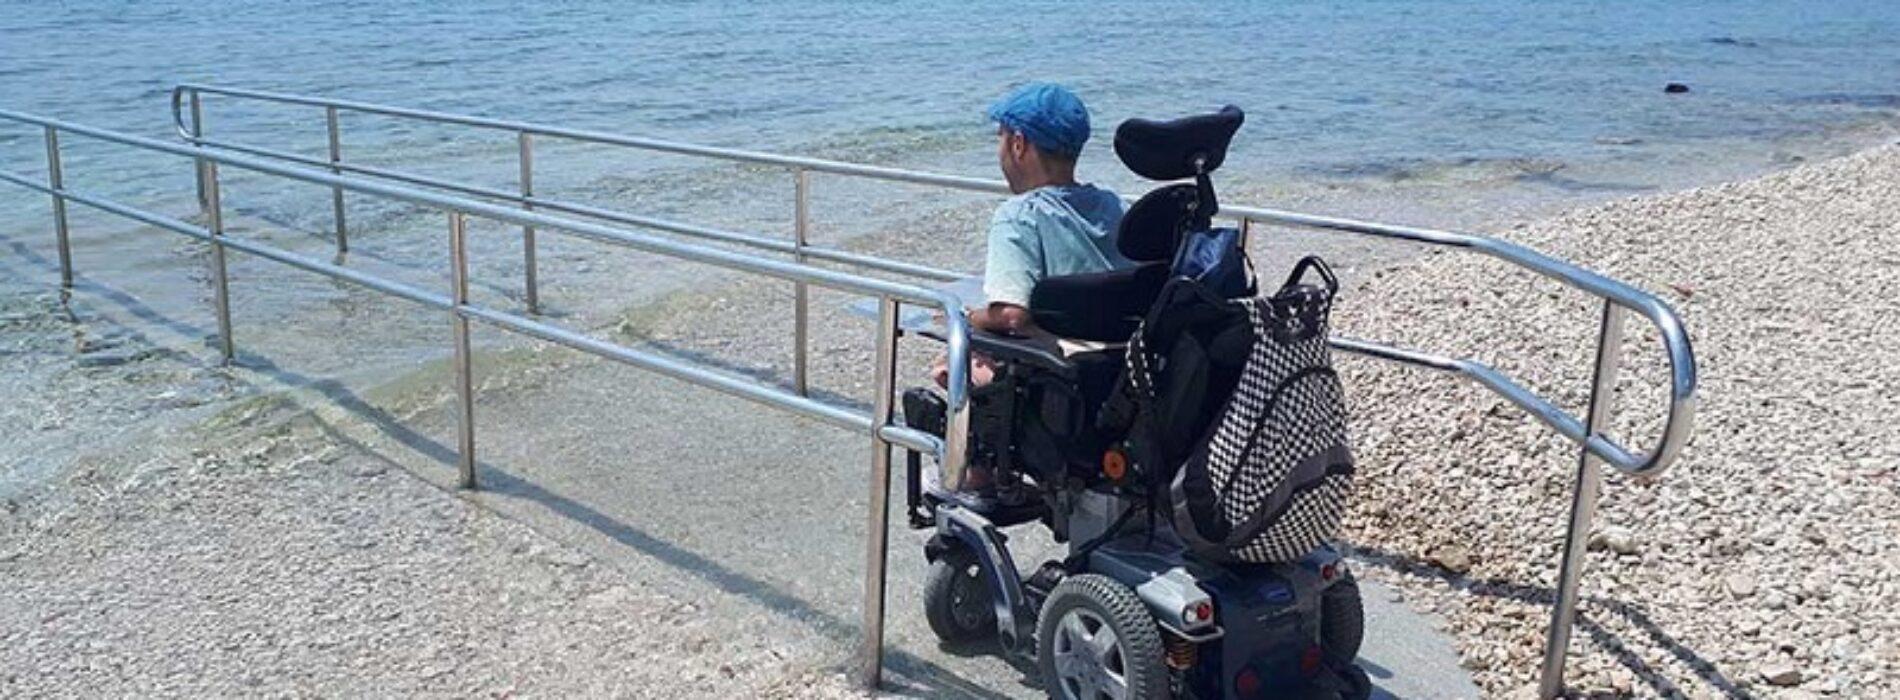 Escape to the sunshine in accessible Pula and Istria in Croatia